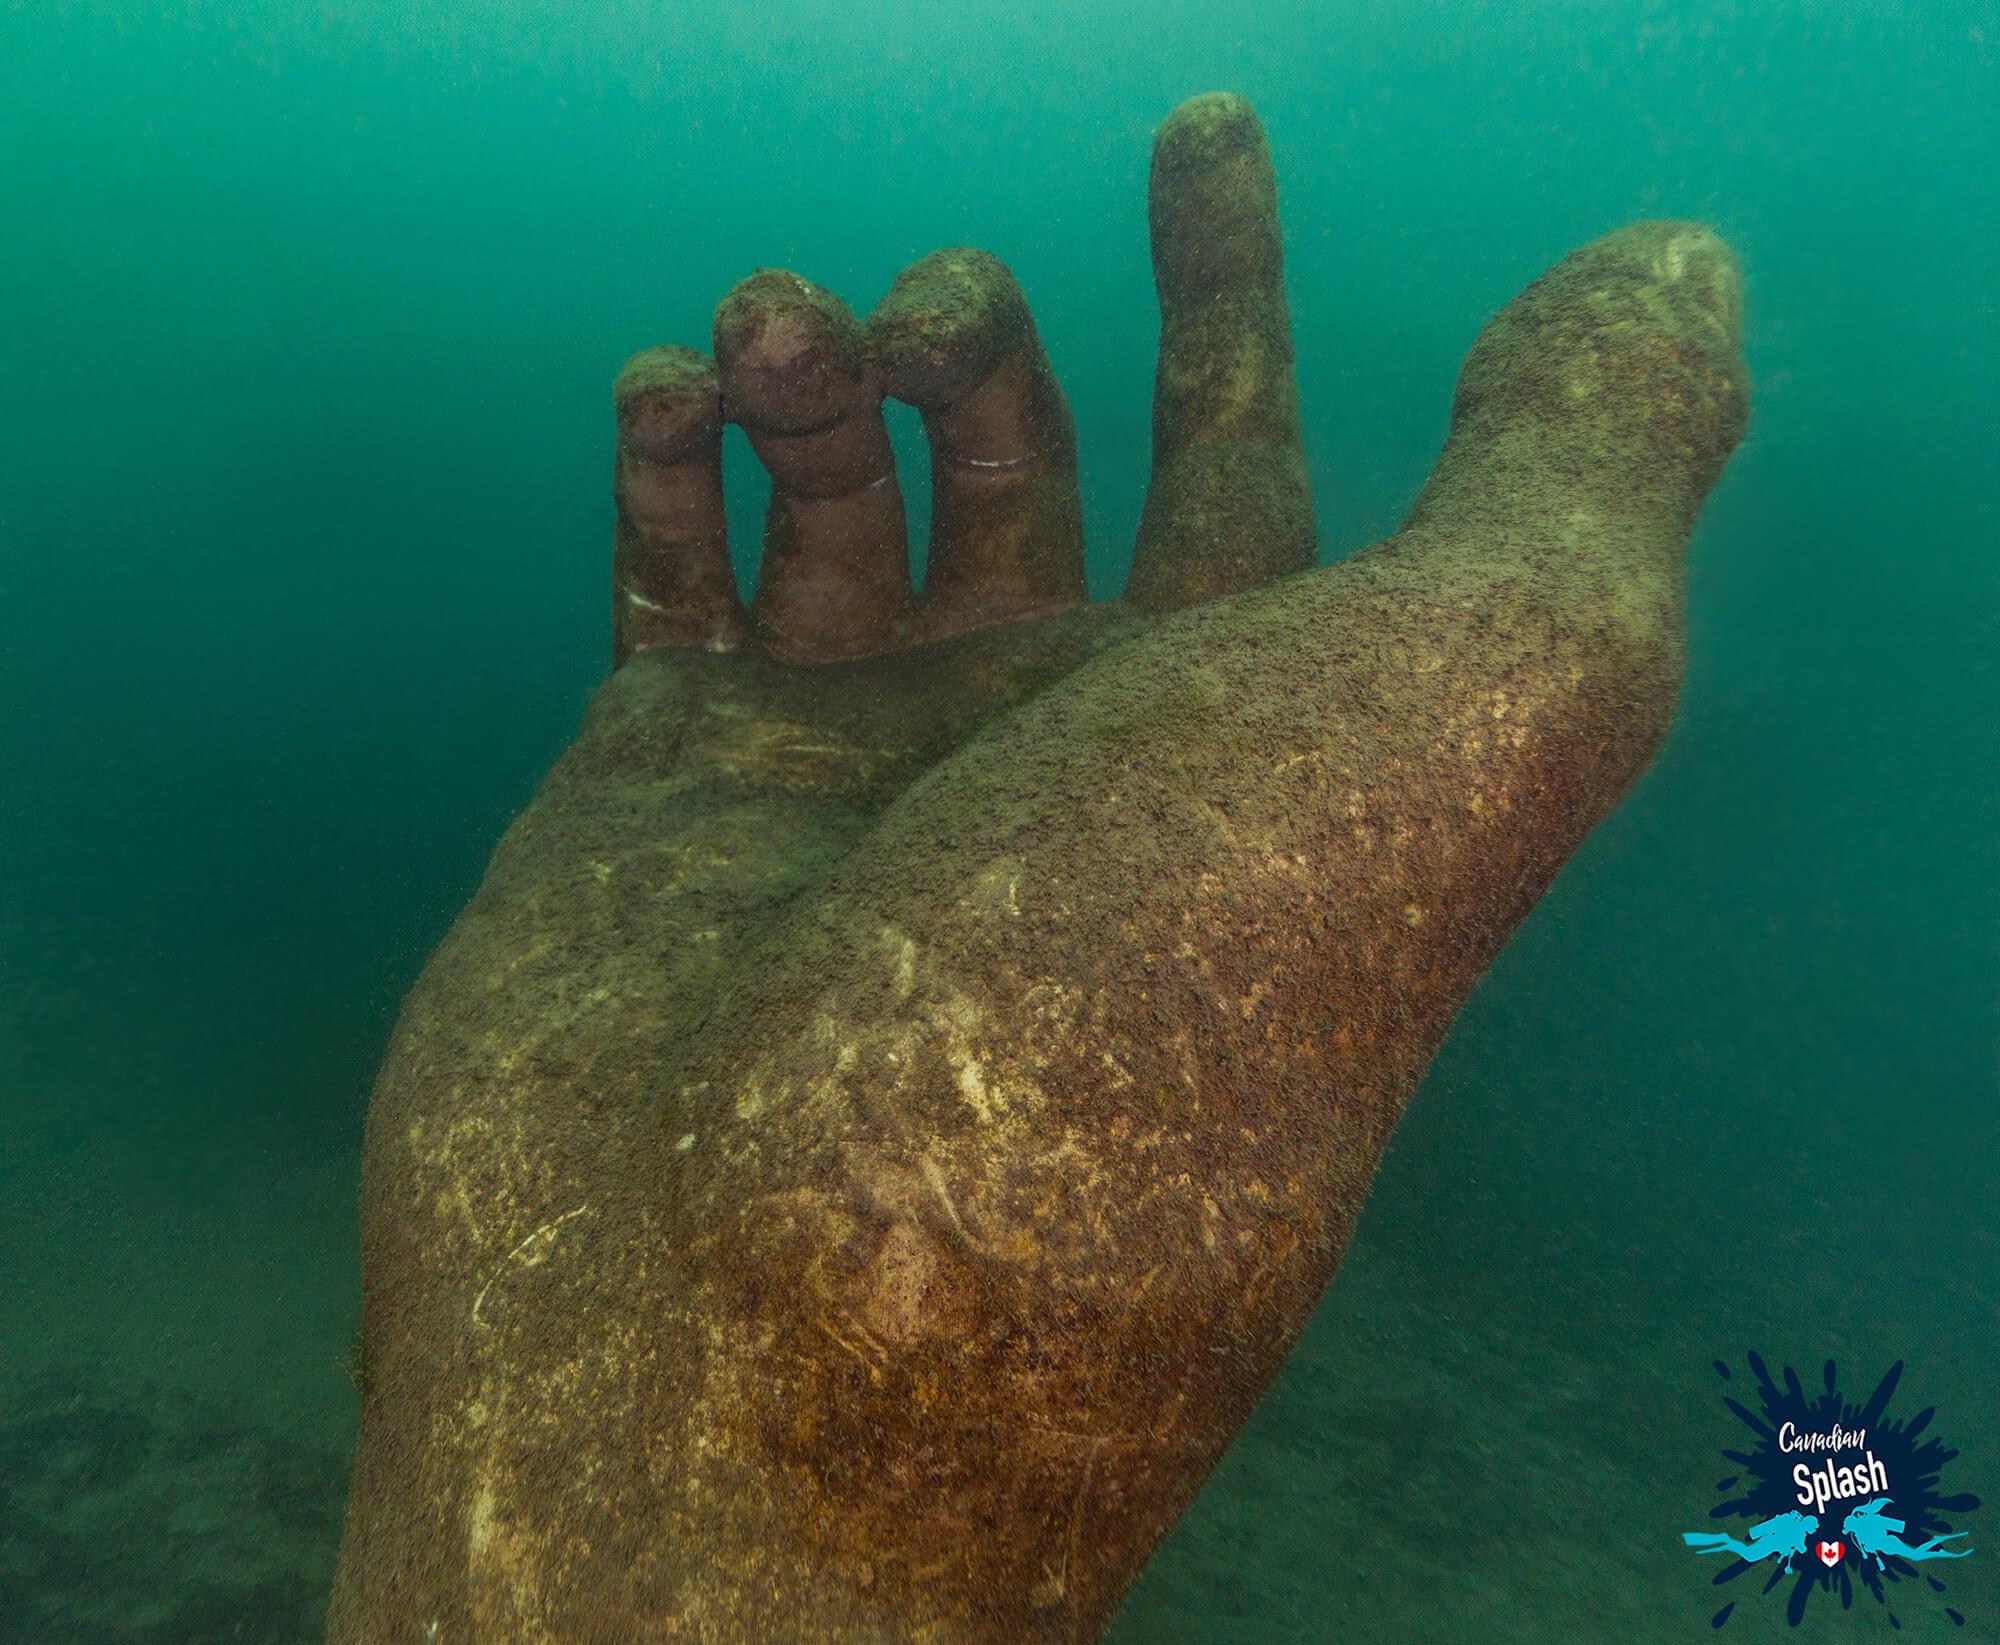 Centeen Park Underwater Hand Statue, Ontario, Scuba Diving Canada